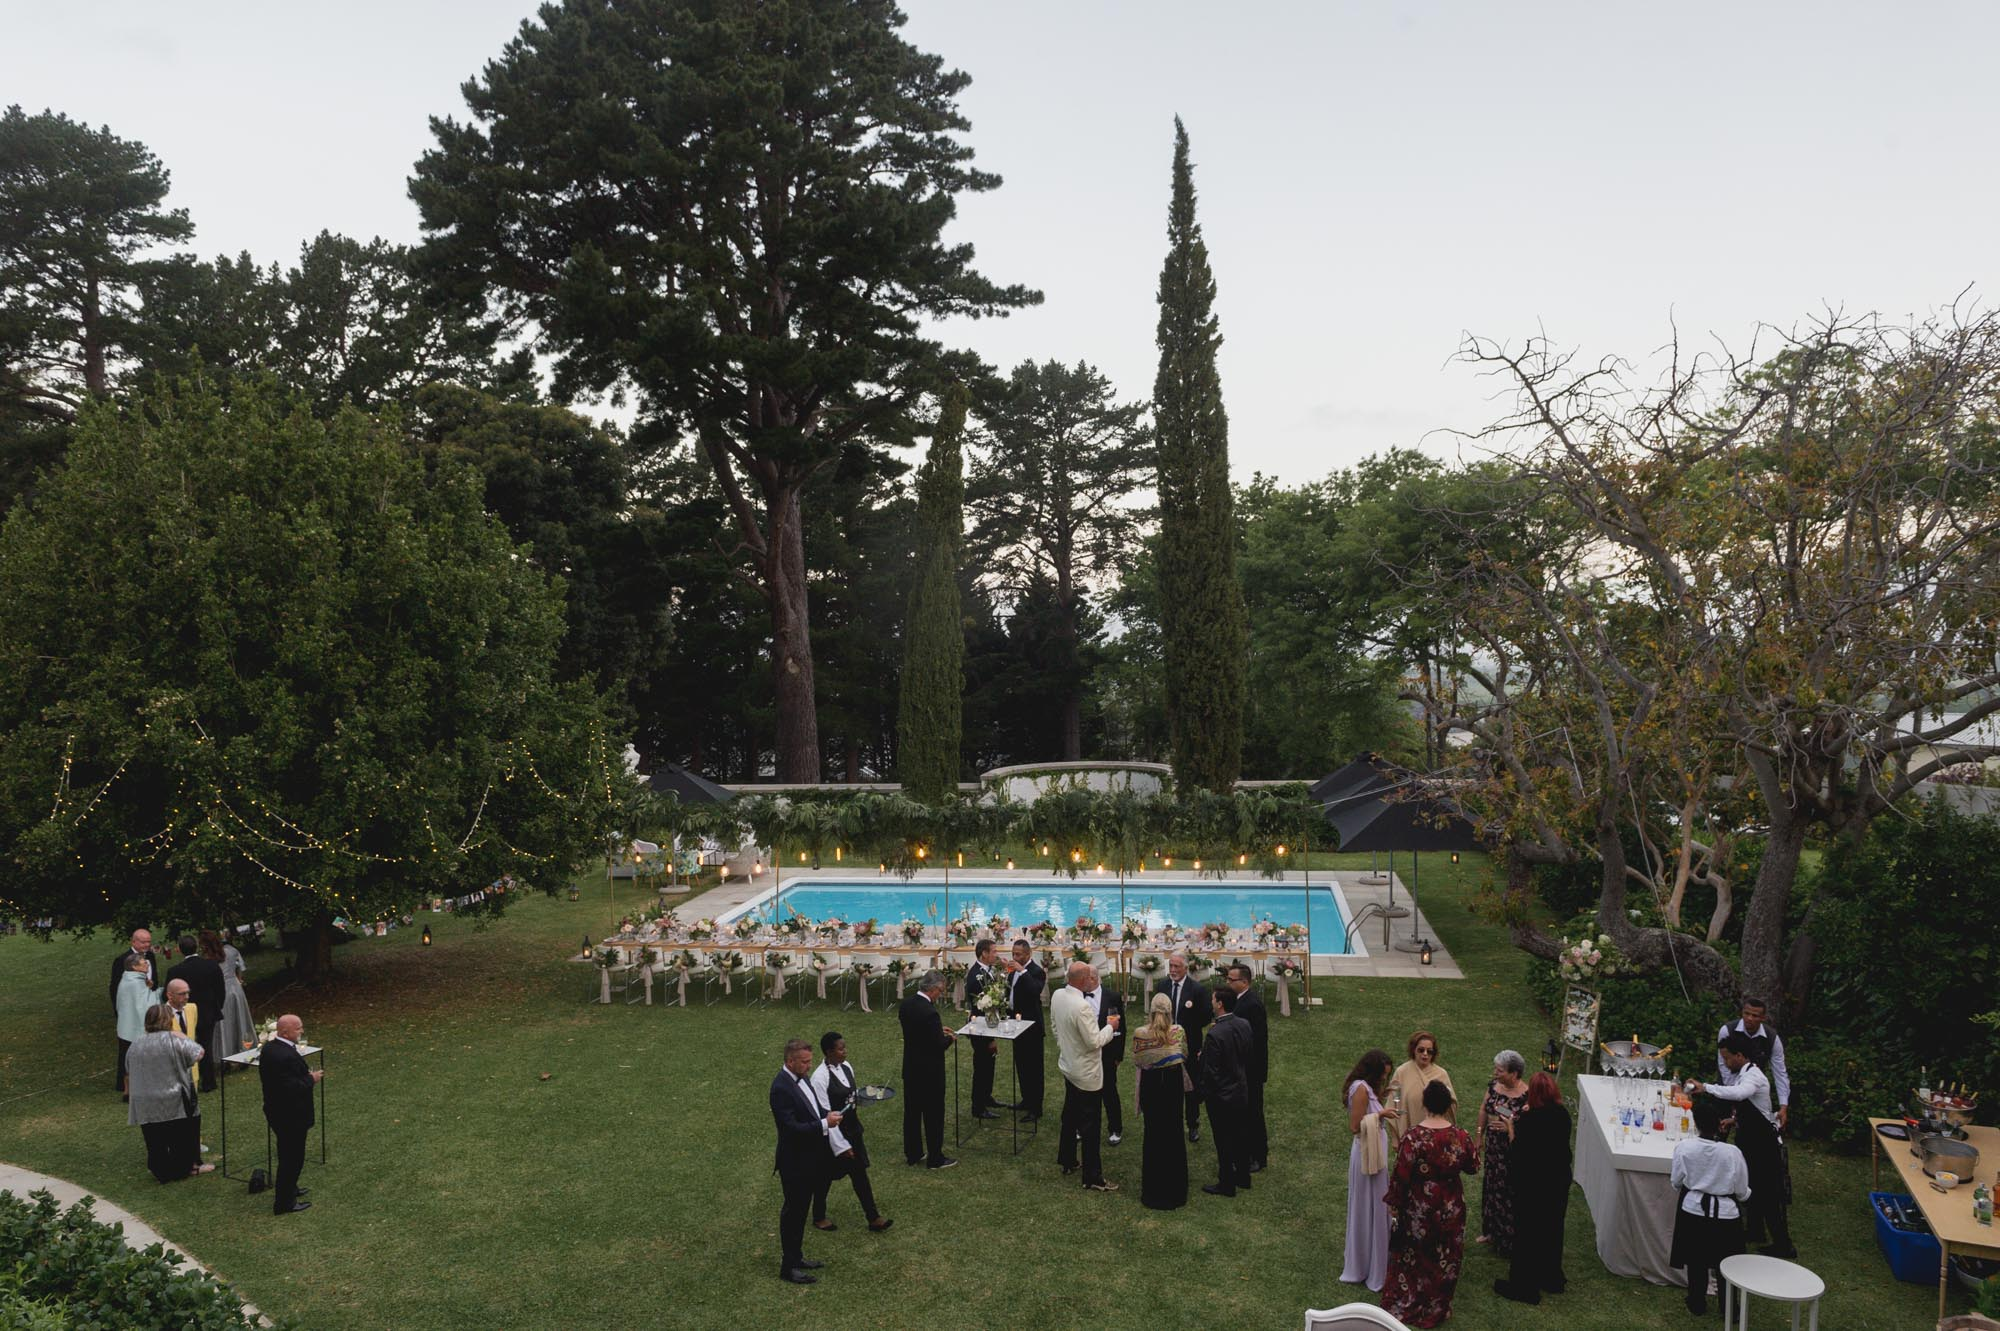 John-henry-wedding-photo-pre-drinks-001.JPG